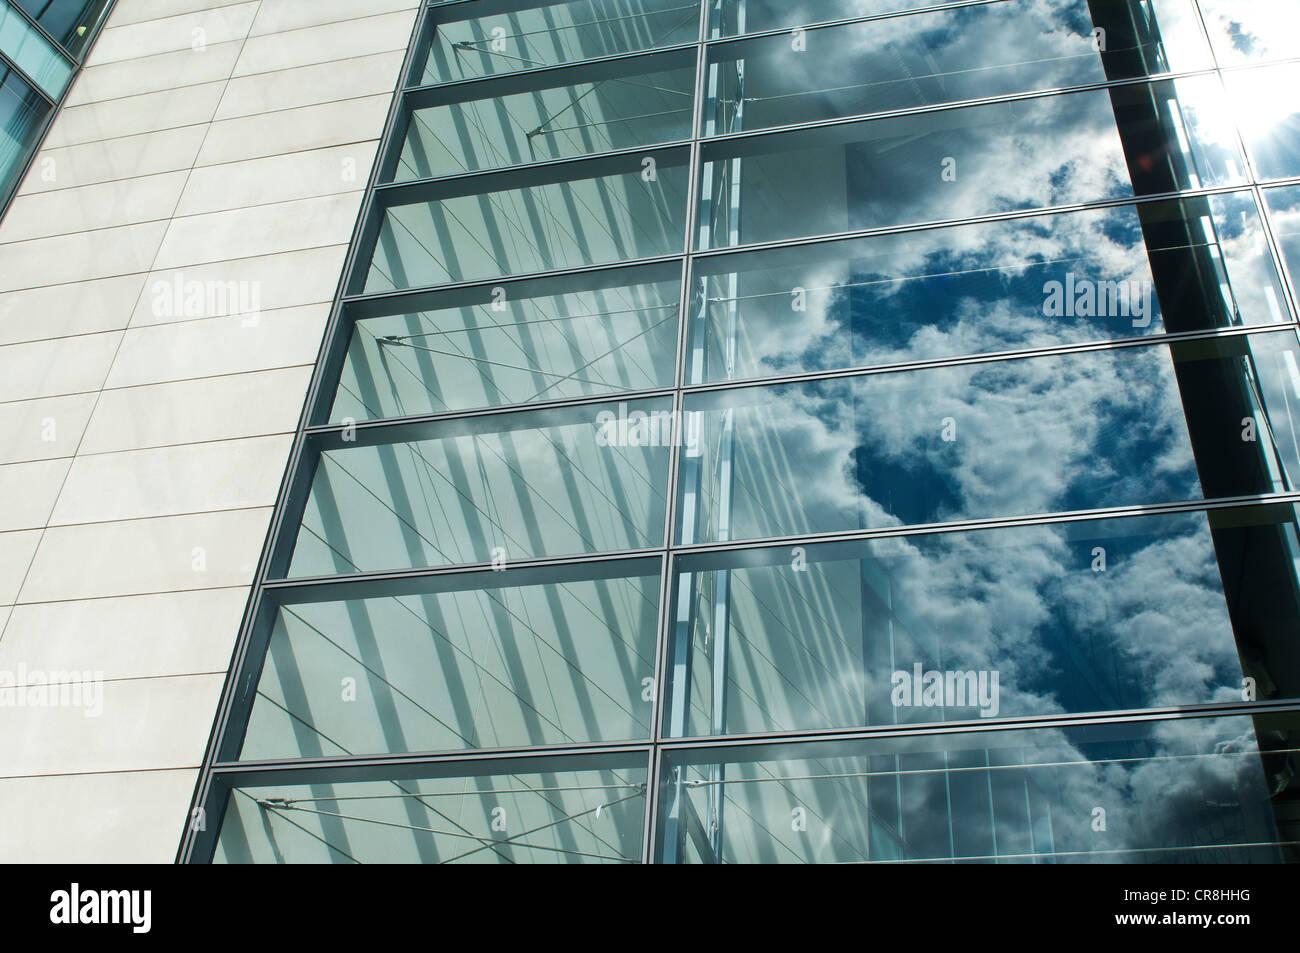 Bewölkten blauen Himmel spiegelt sich in Bürofenster Stockbild